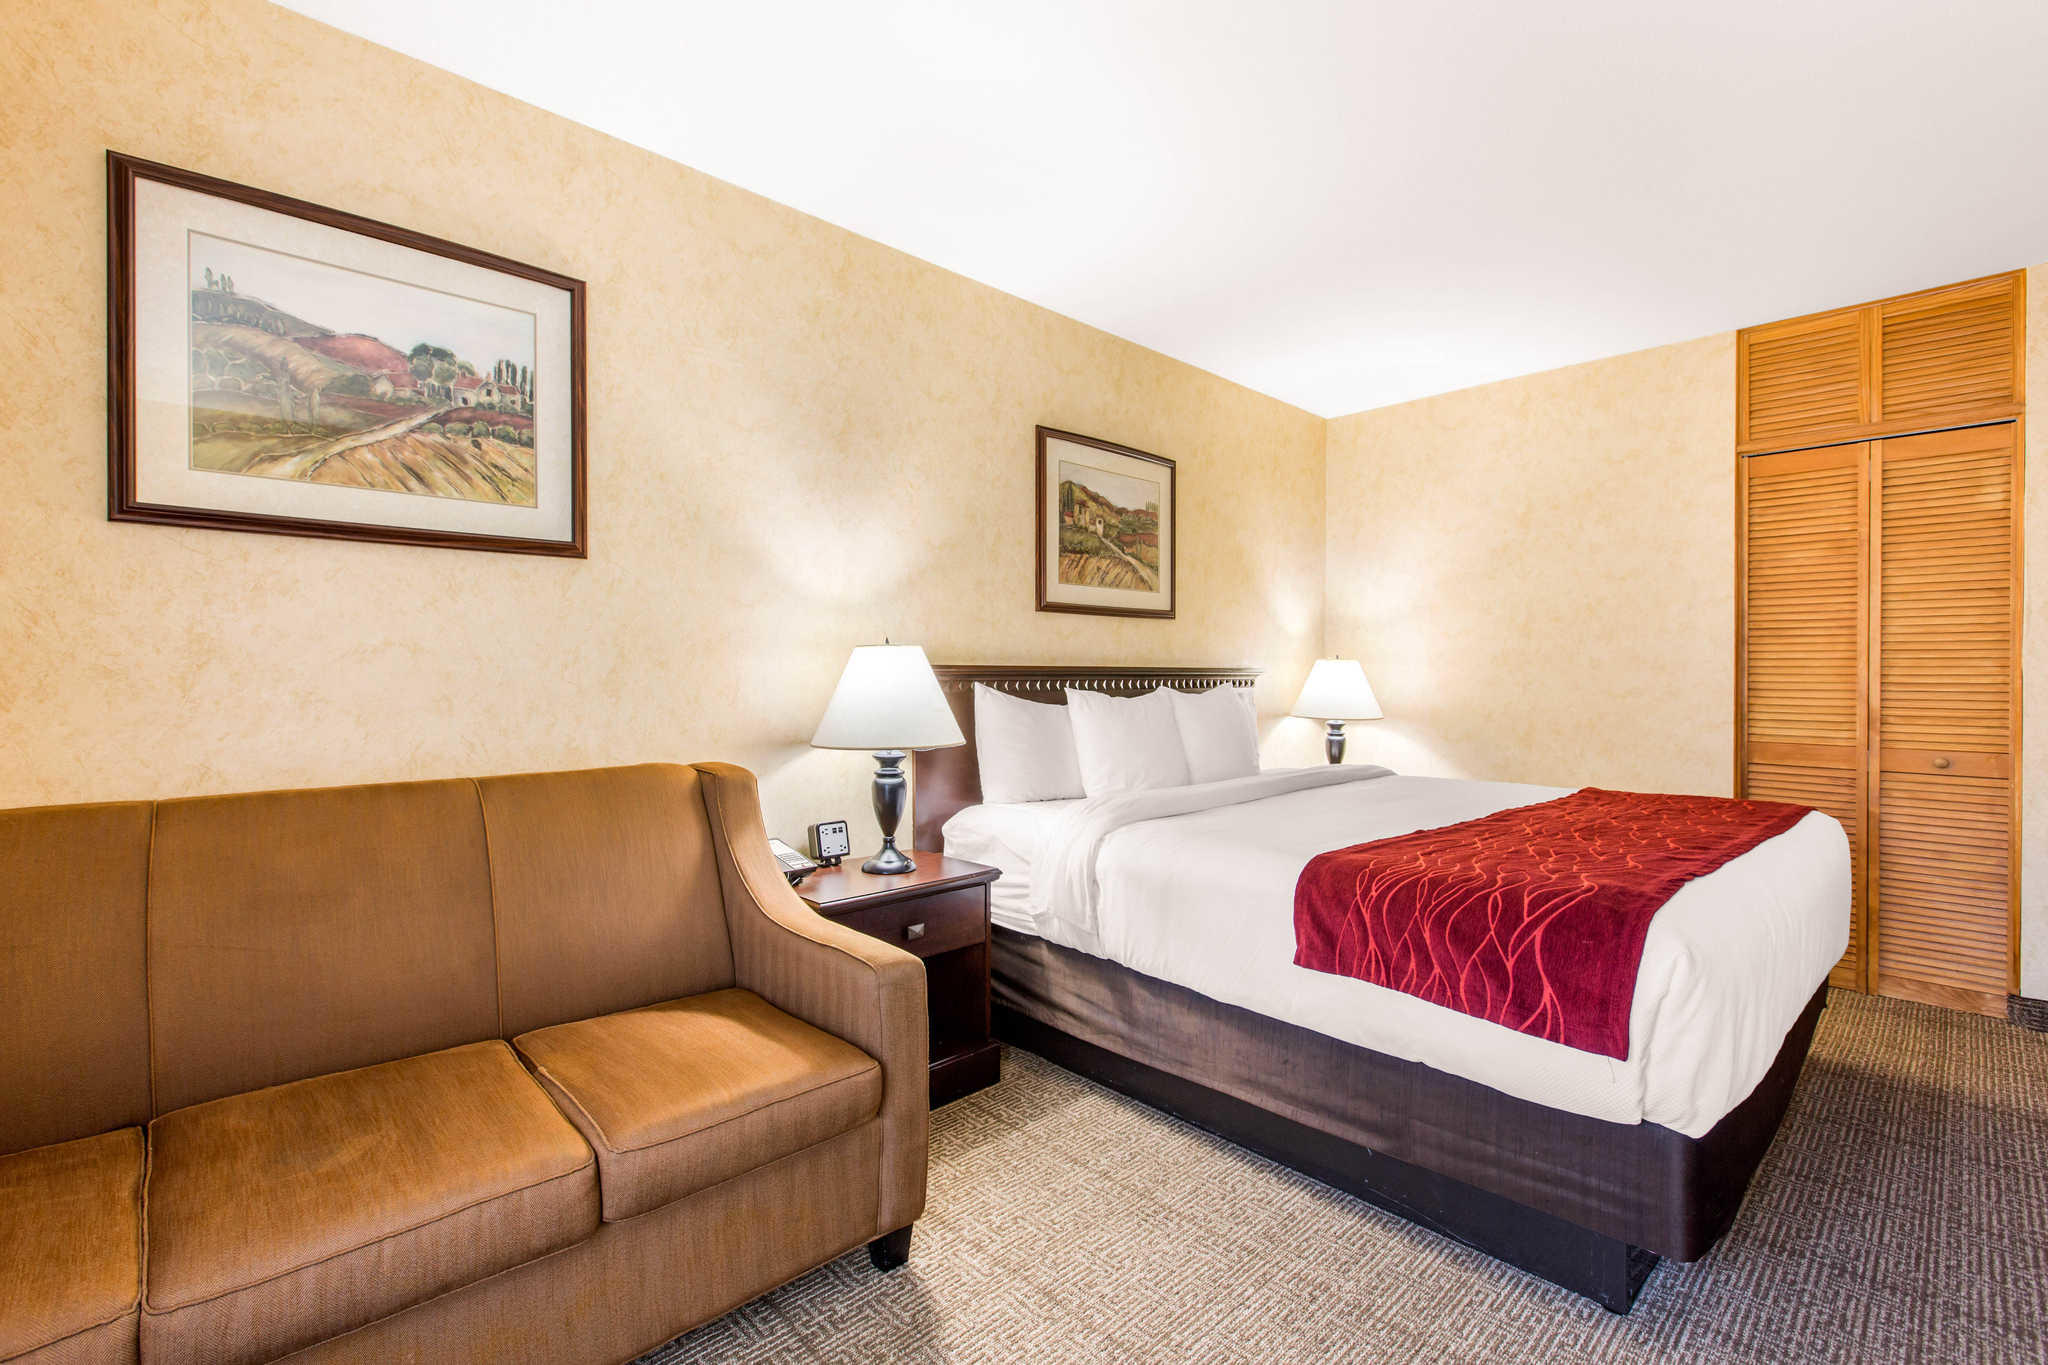 Comfort Inn Escondido San Diego North County image 7